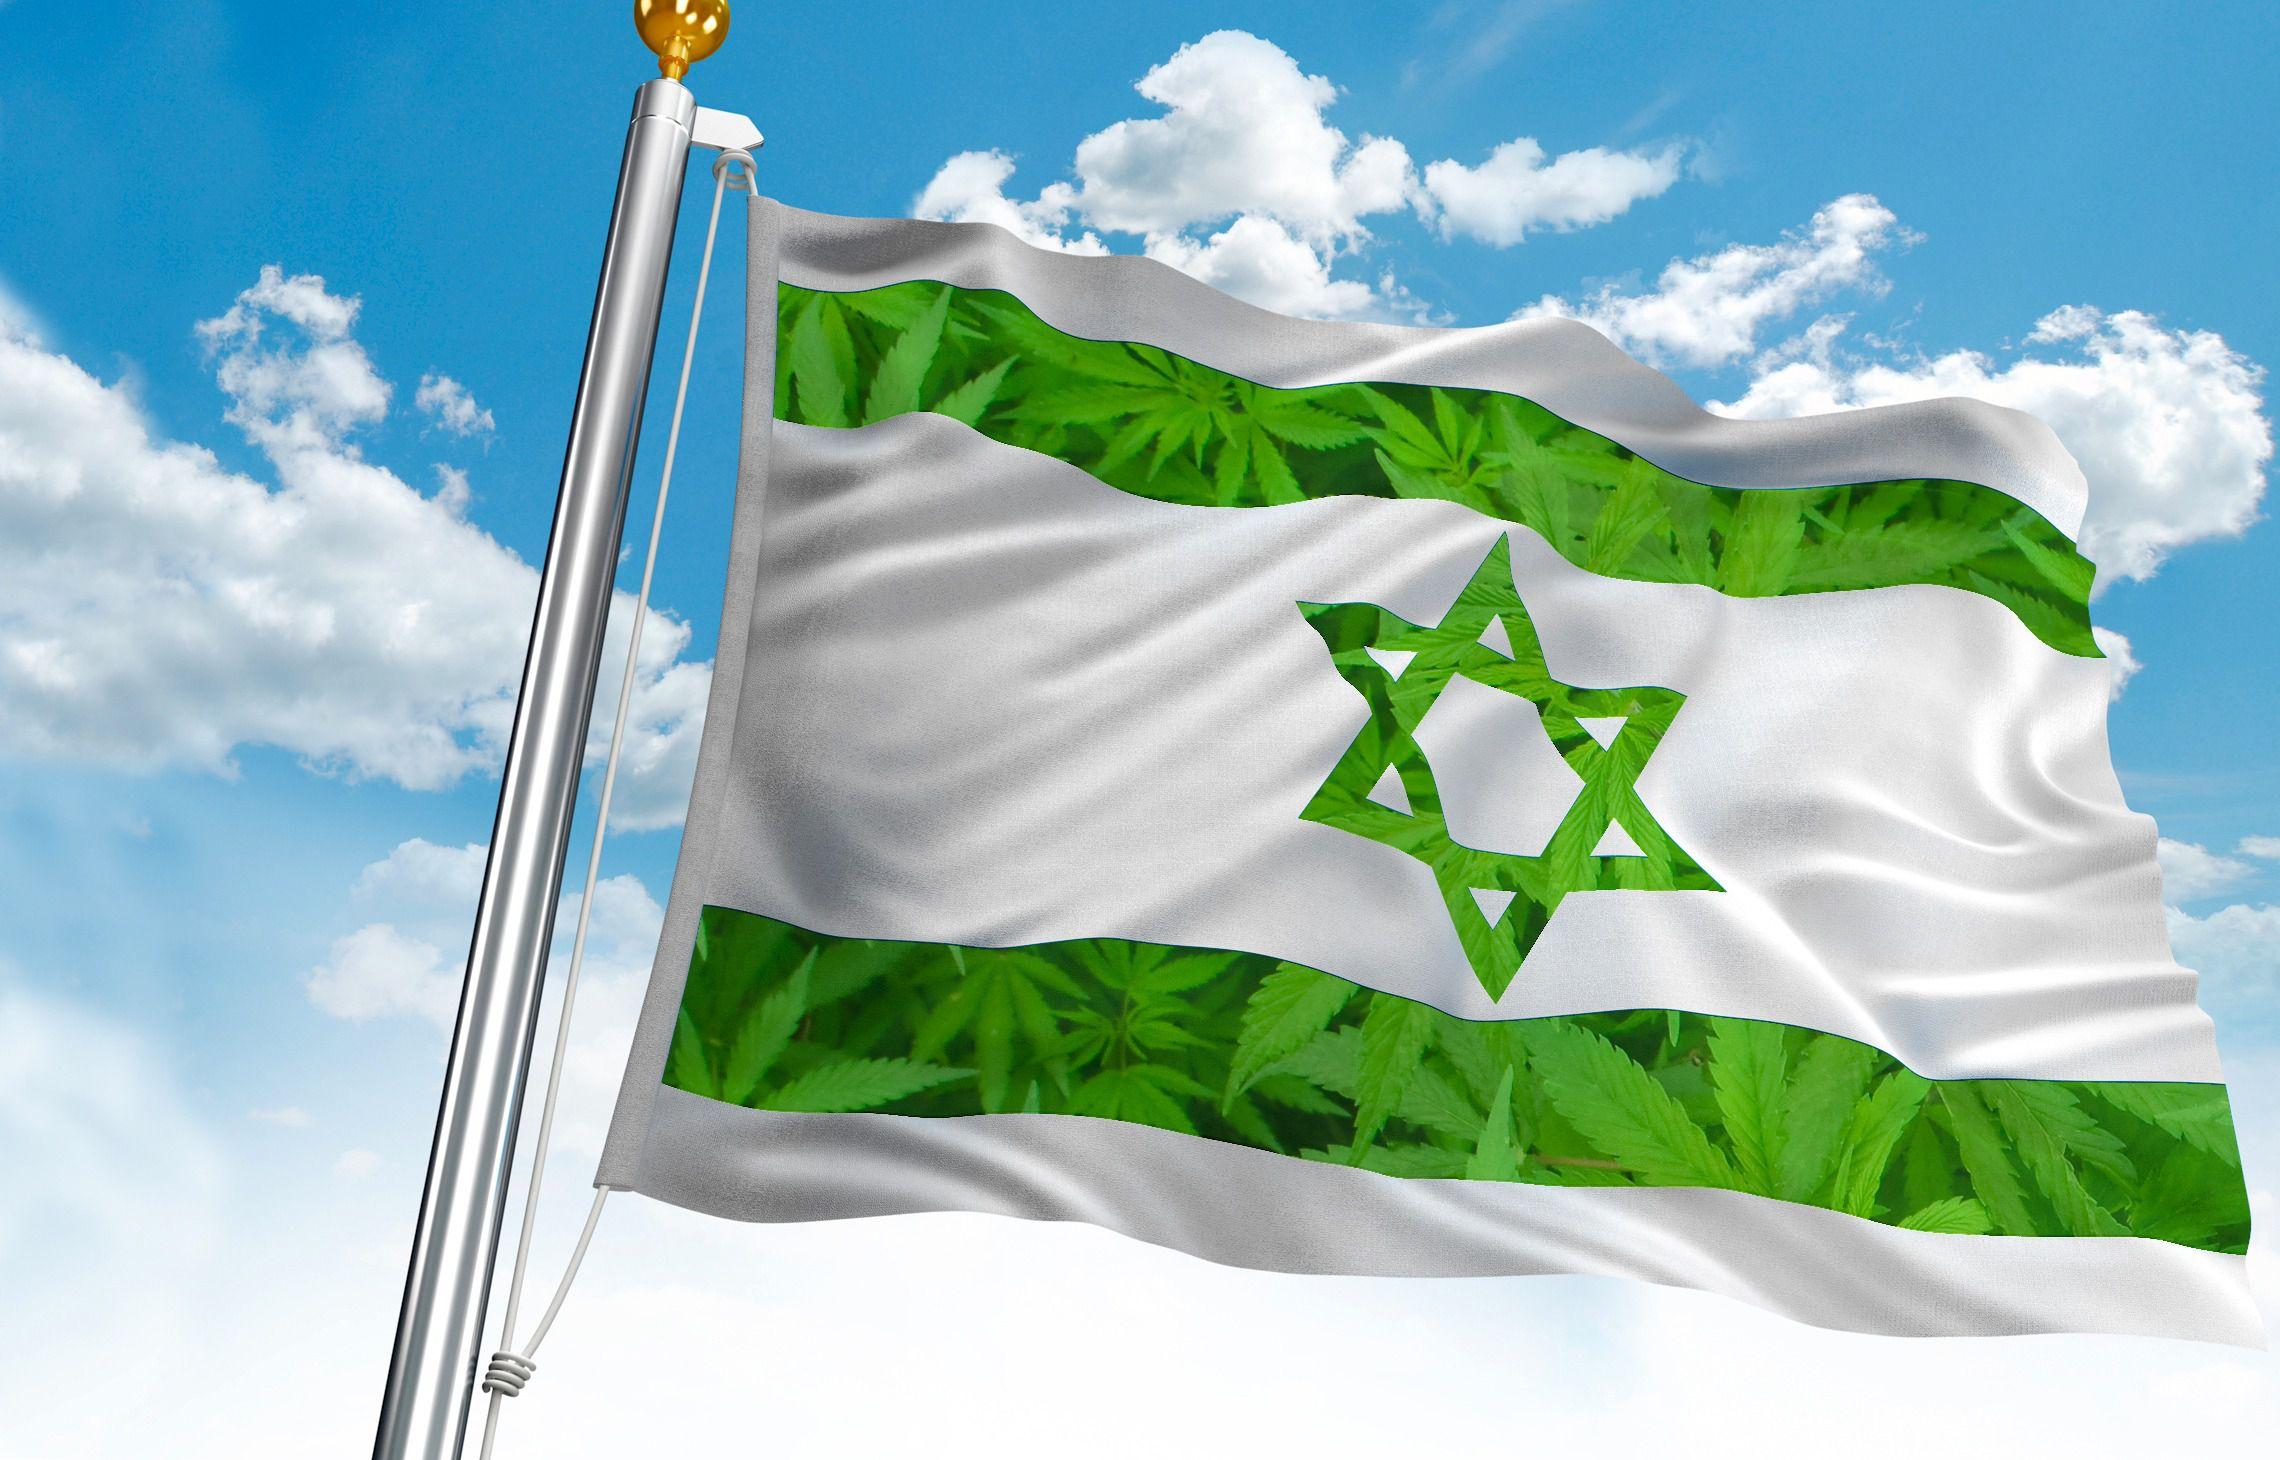 https://forward.com/fast-forward/366463/israeli-and-american-companies-create-marijuana-inhaler-for-sleep/